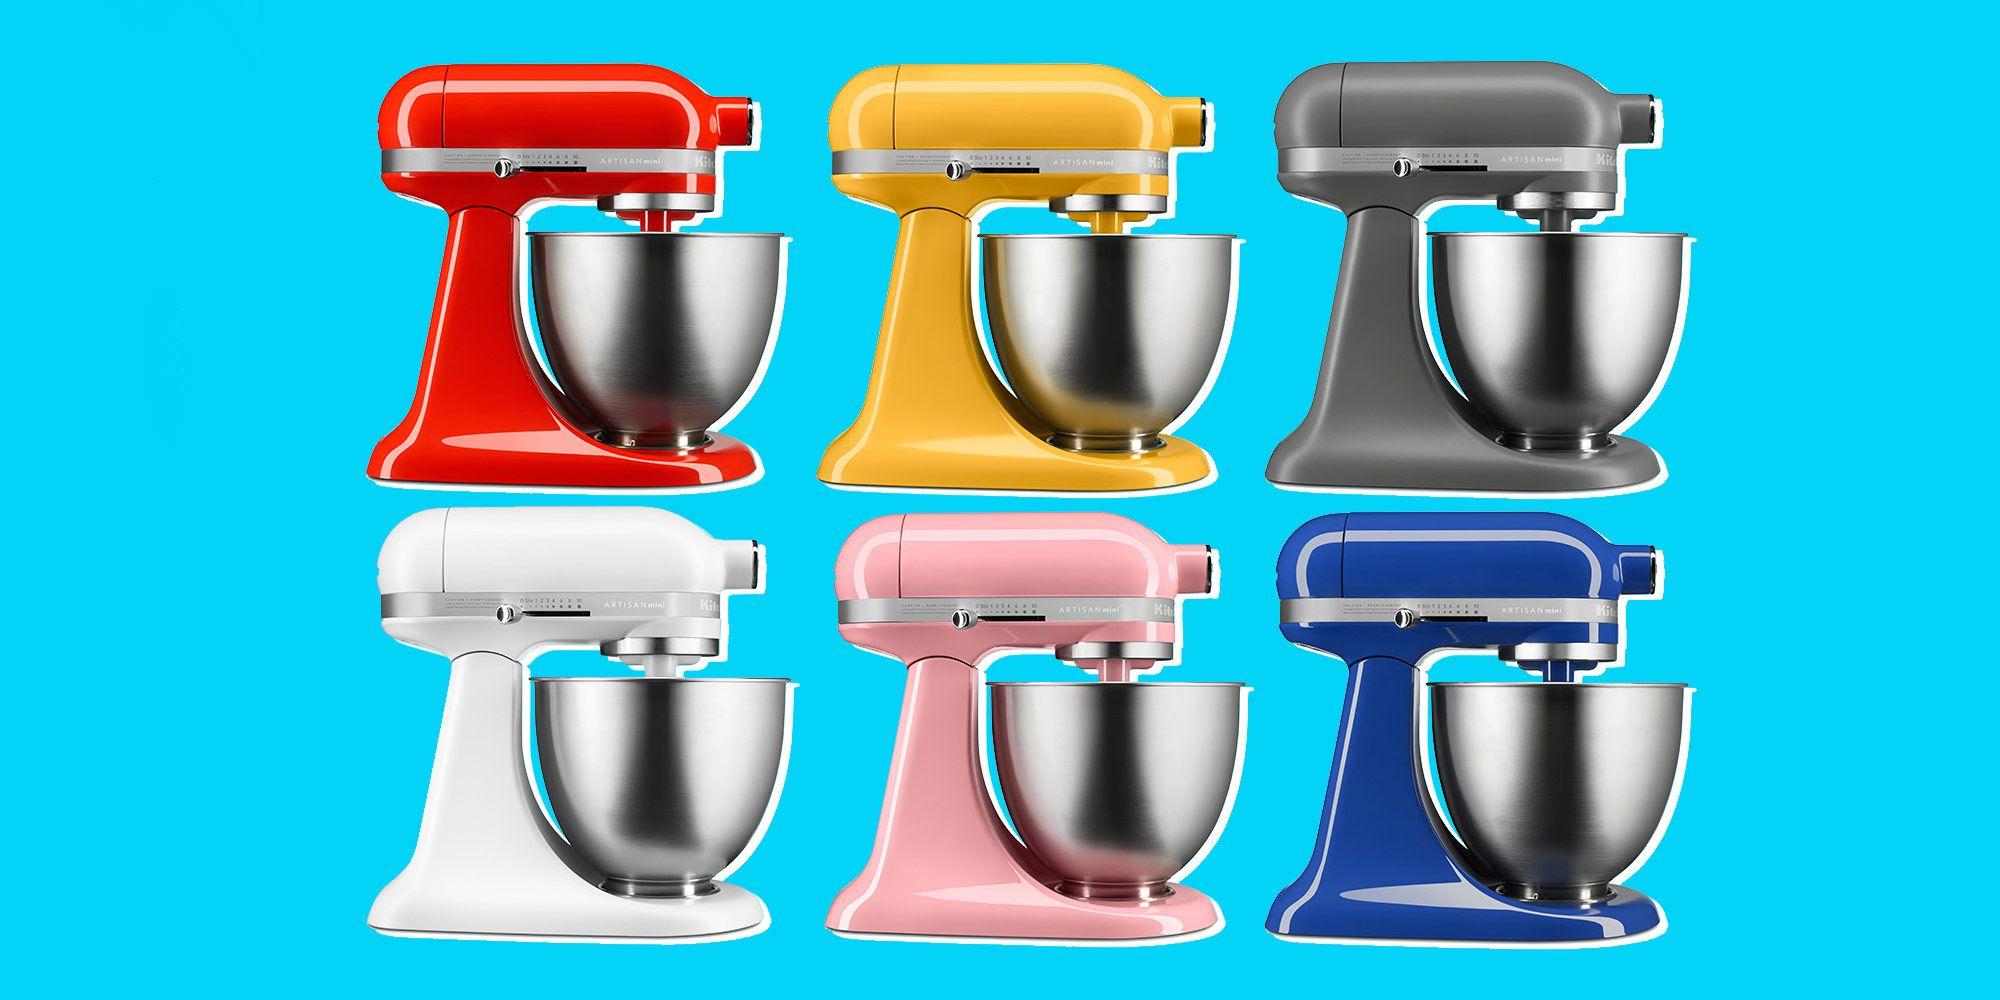 KitchenAid s Artisan Mini Is the Best Mixer for Millennials